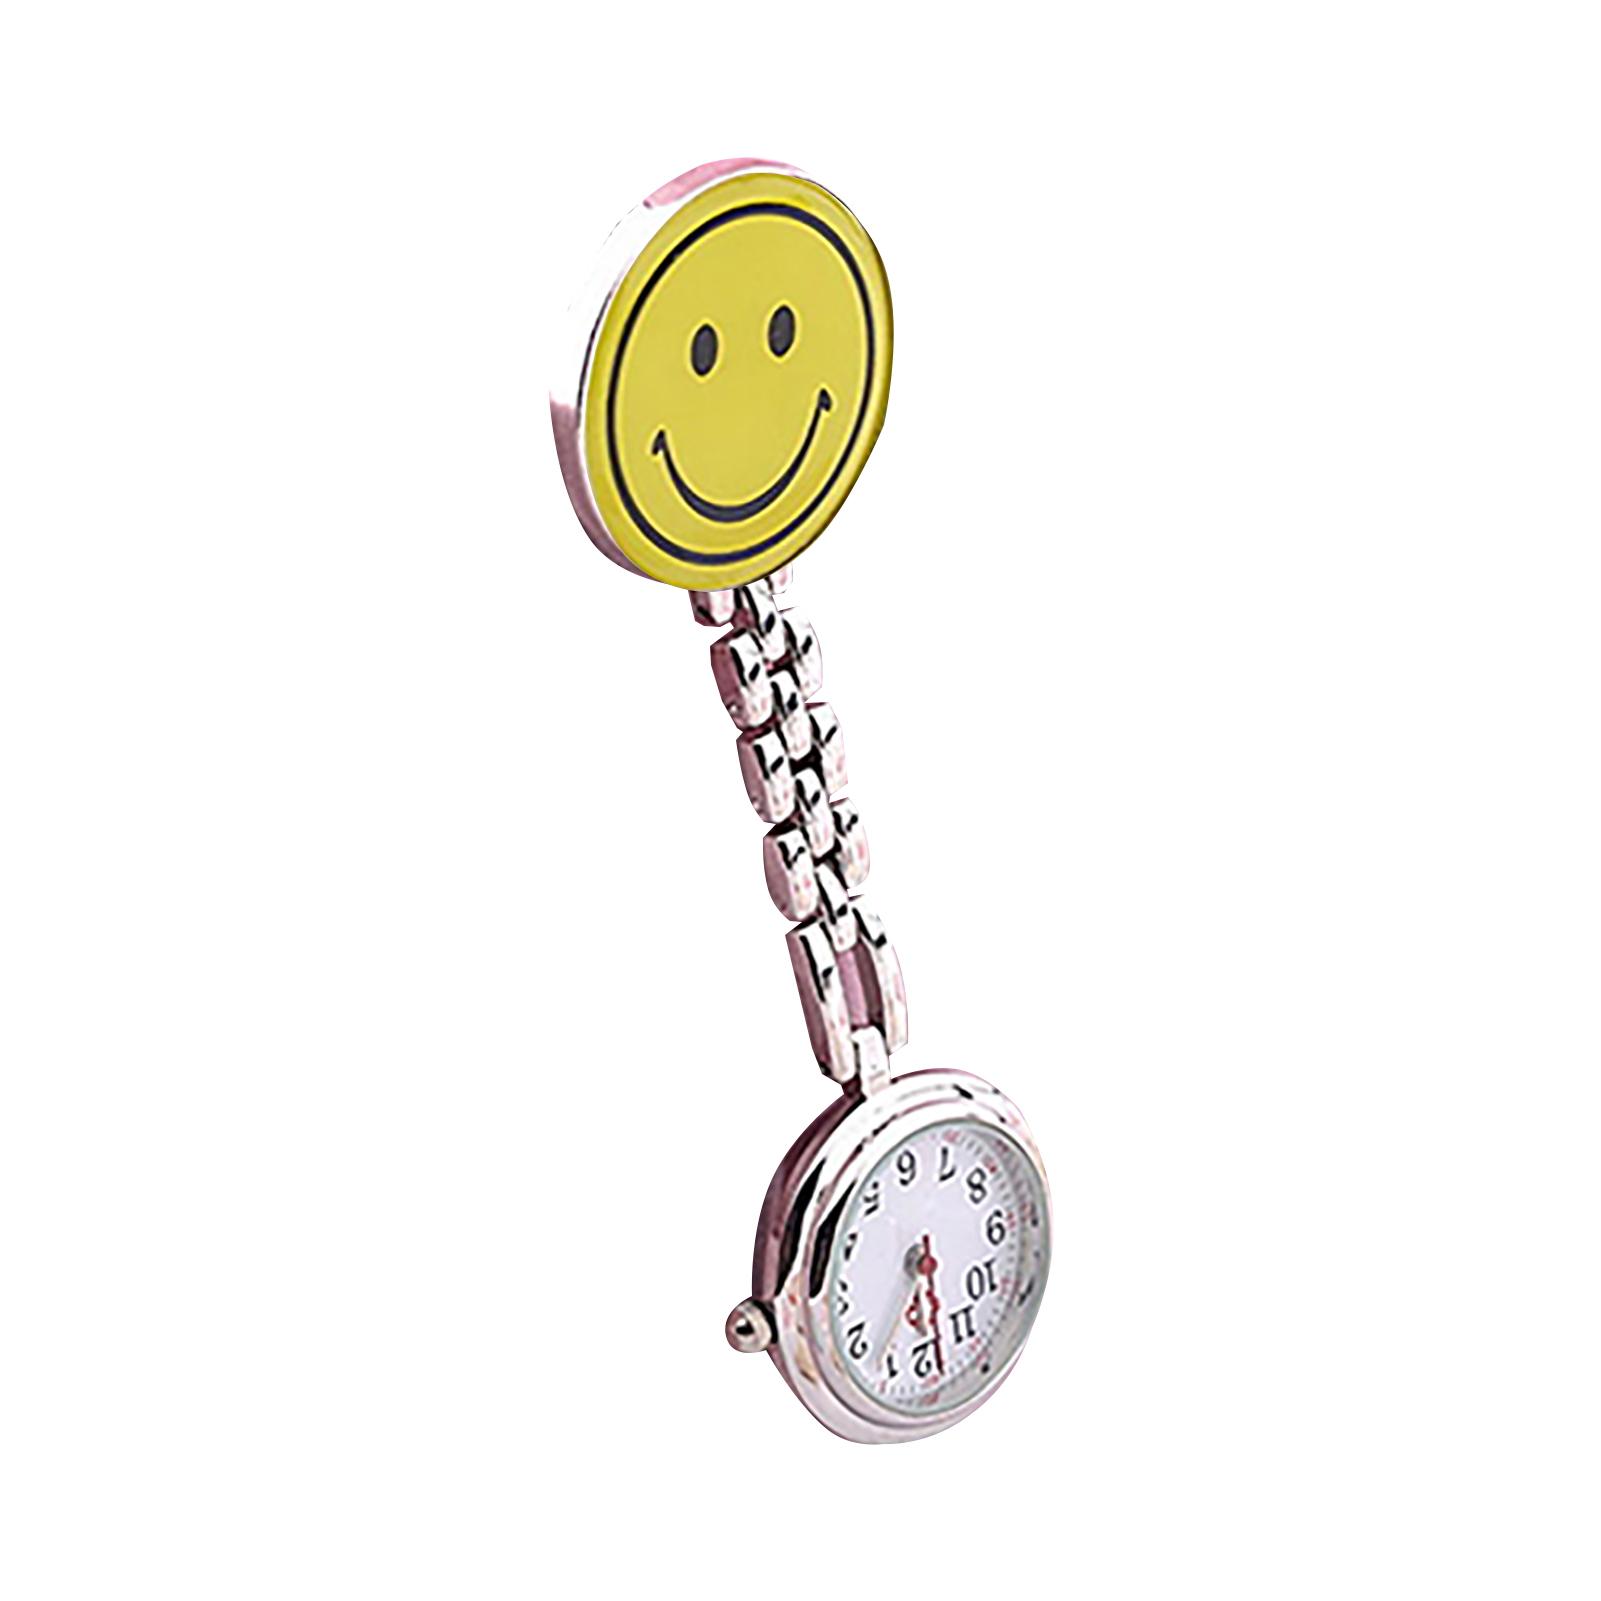 Women-Butterfly-Smile-Face-Analog-Quartz-Clip-On-Brooch-Pocket-Nurse-Watch-Hot thumbnail 15